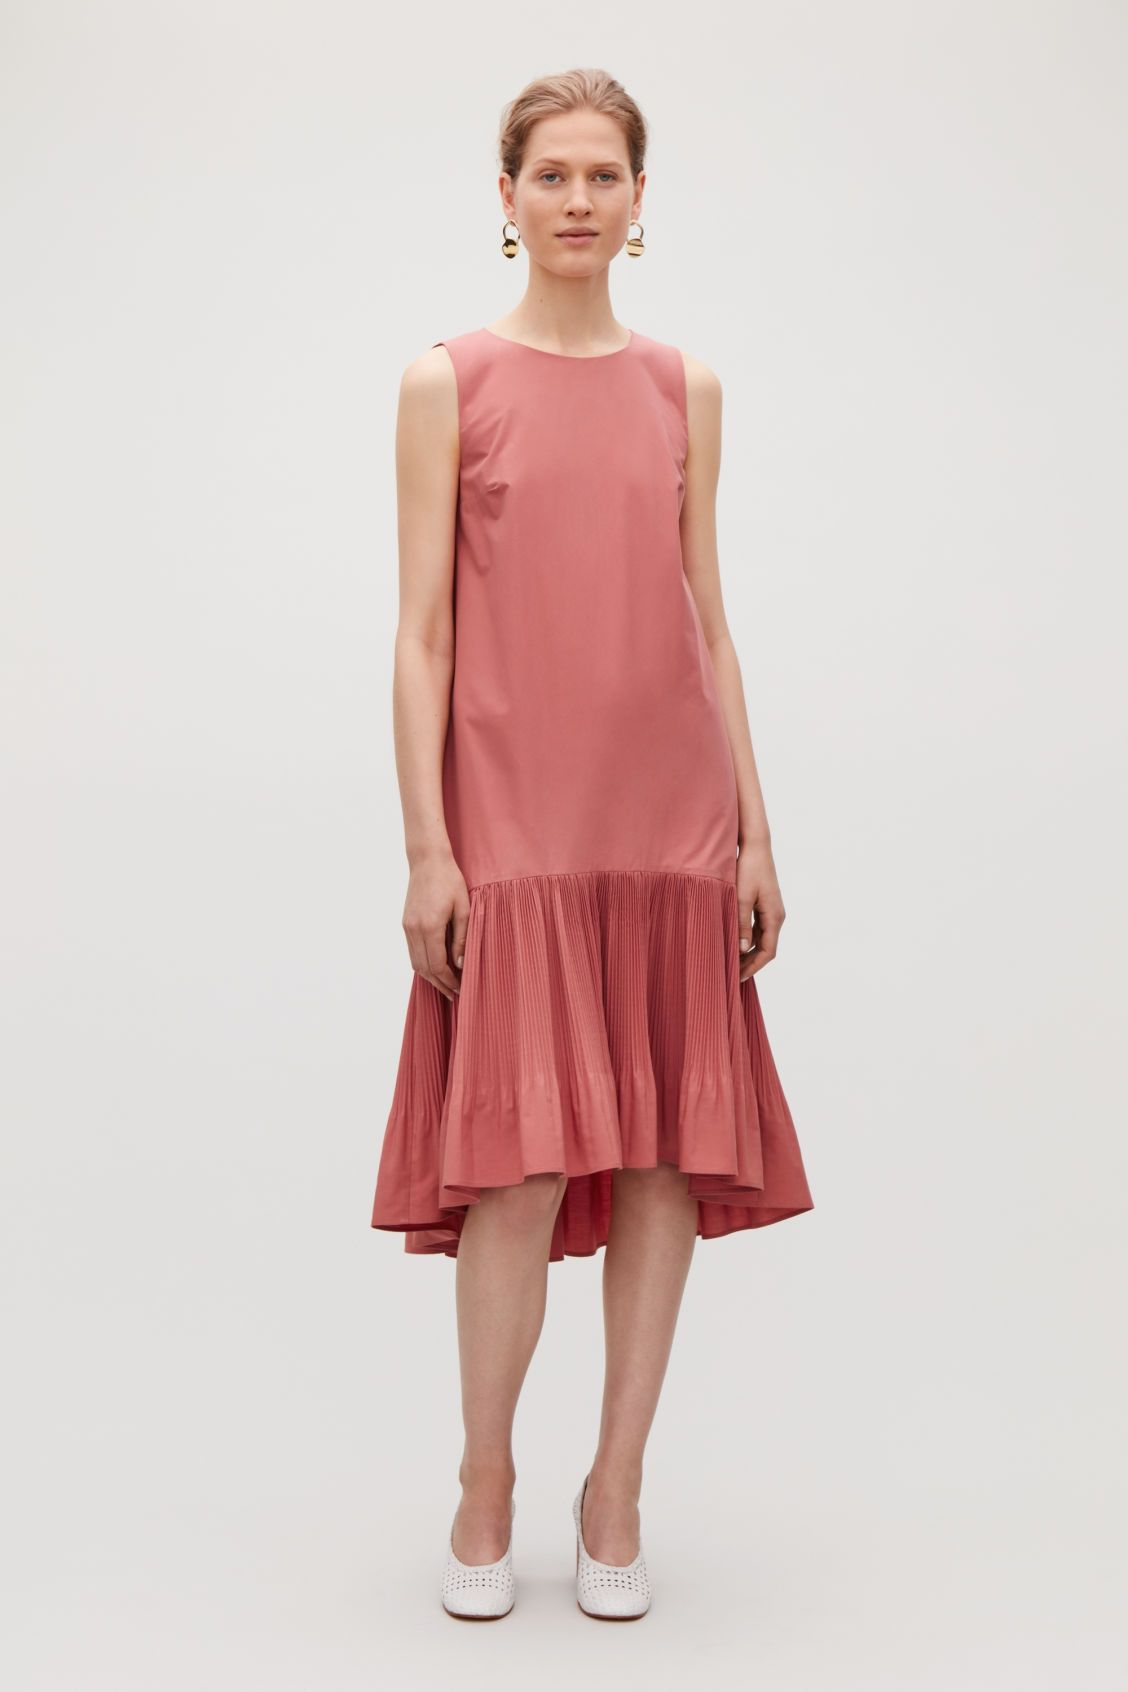 f93fd2ae3 PLEATED SLEEVELESS DRESS - Fresh berry - Dresses - COS GB | ATM in ...